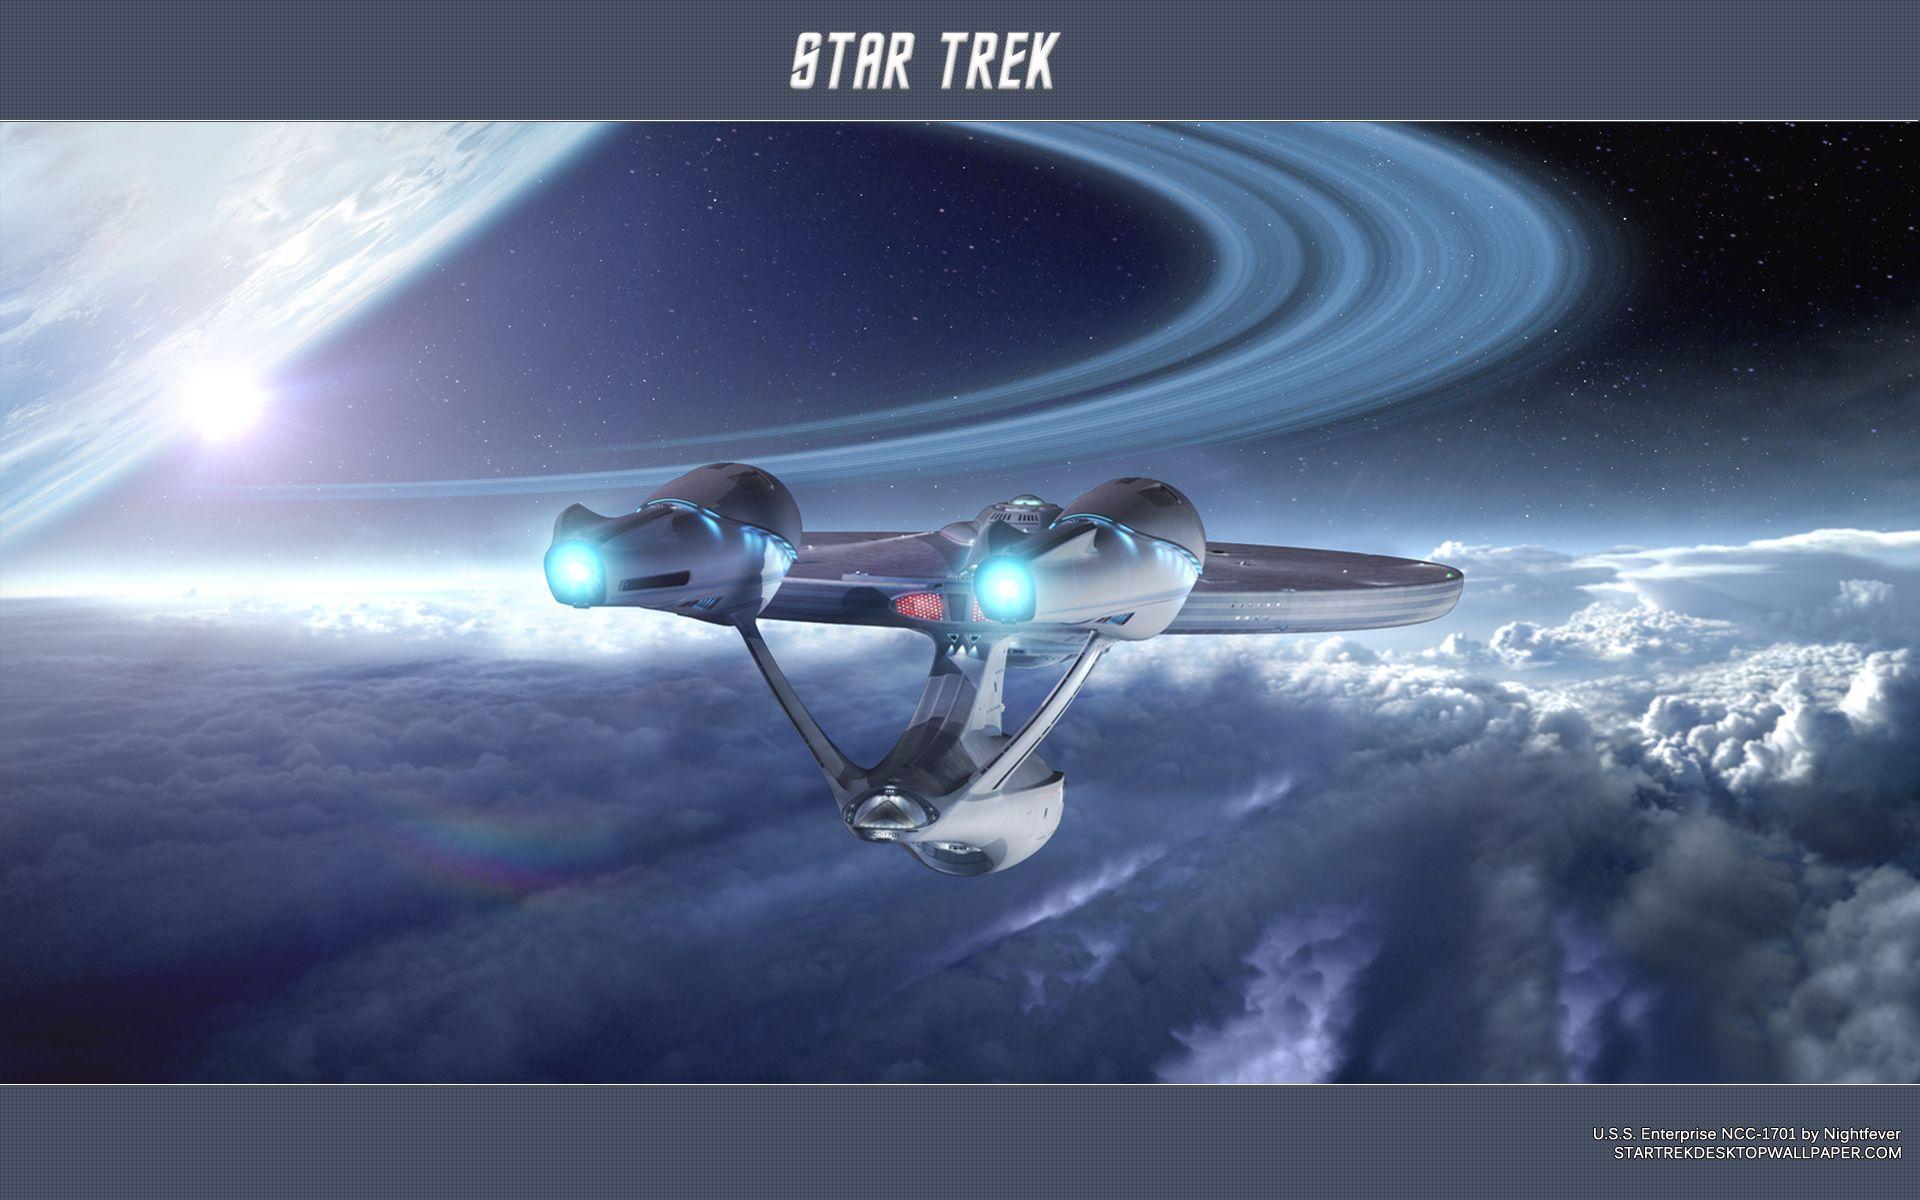 new enterprise Star trek discovery - klingon ship crash into uss europa - admiral ship self destruct - duration: 4:57 peter francis 740,565 views.